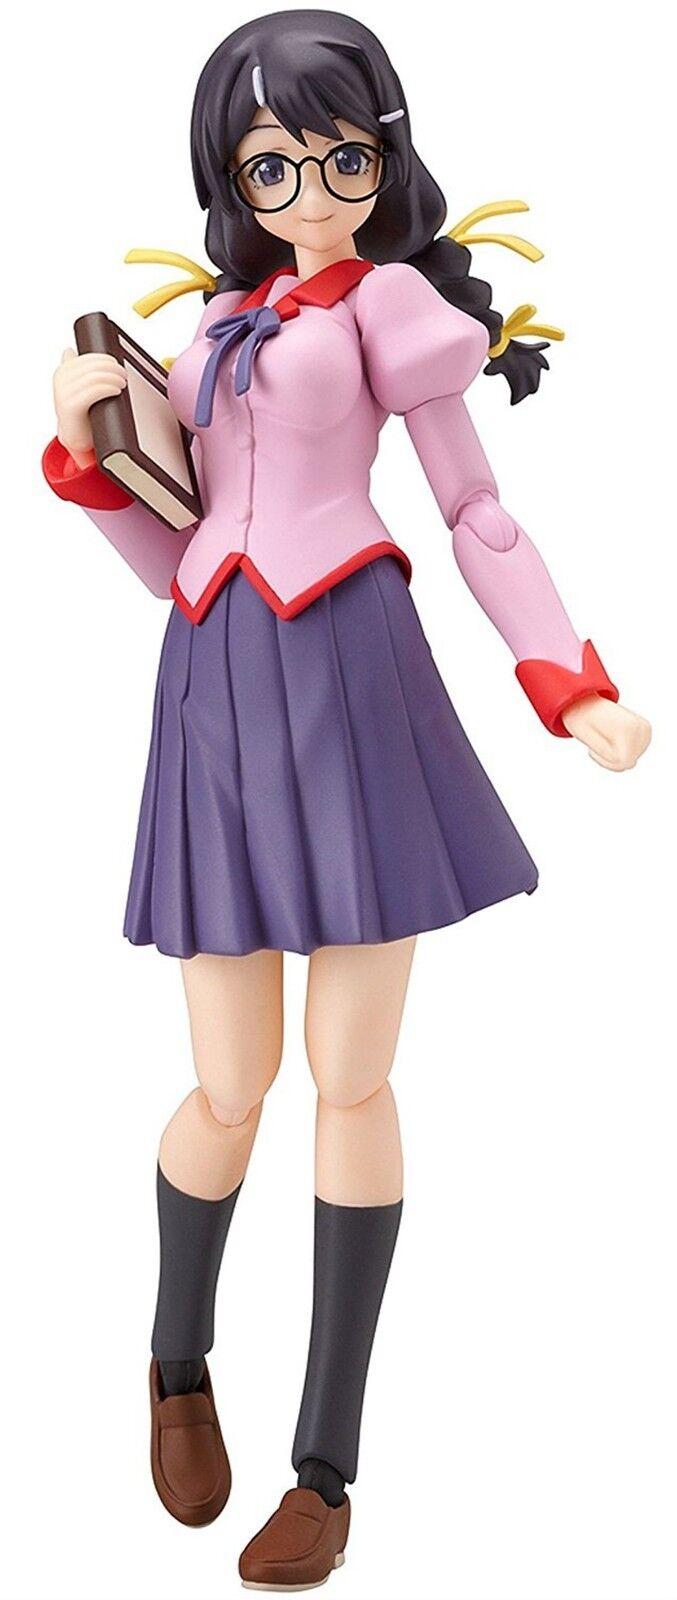 Figma 147 Bakemonogatari Tsubasa Hanekawa Figura Max Factory Japón Nuevo F S Nu